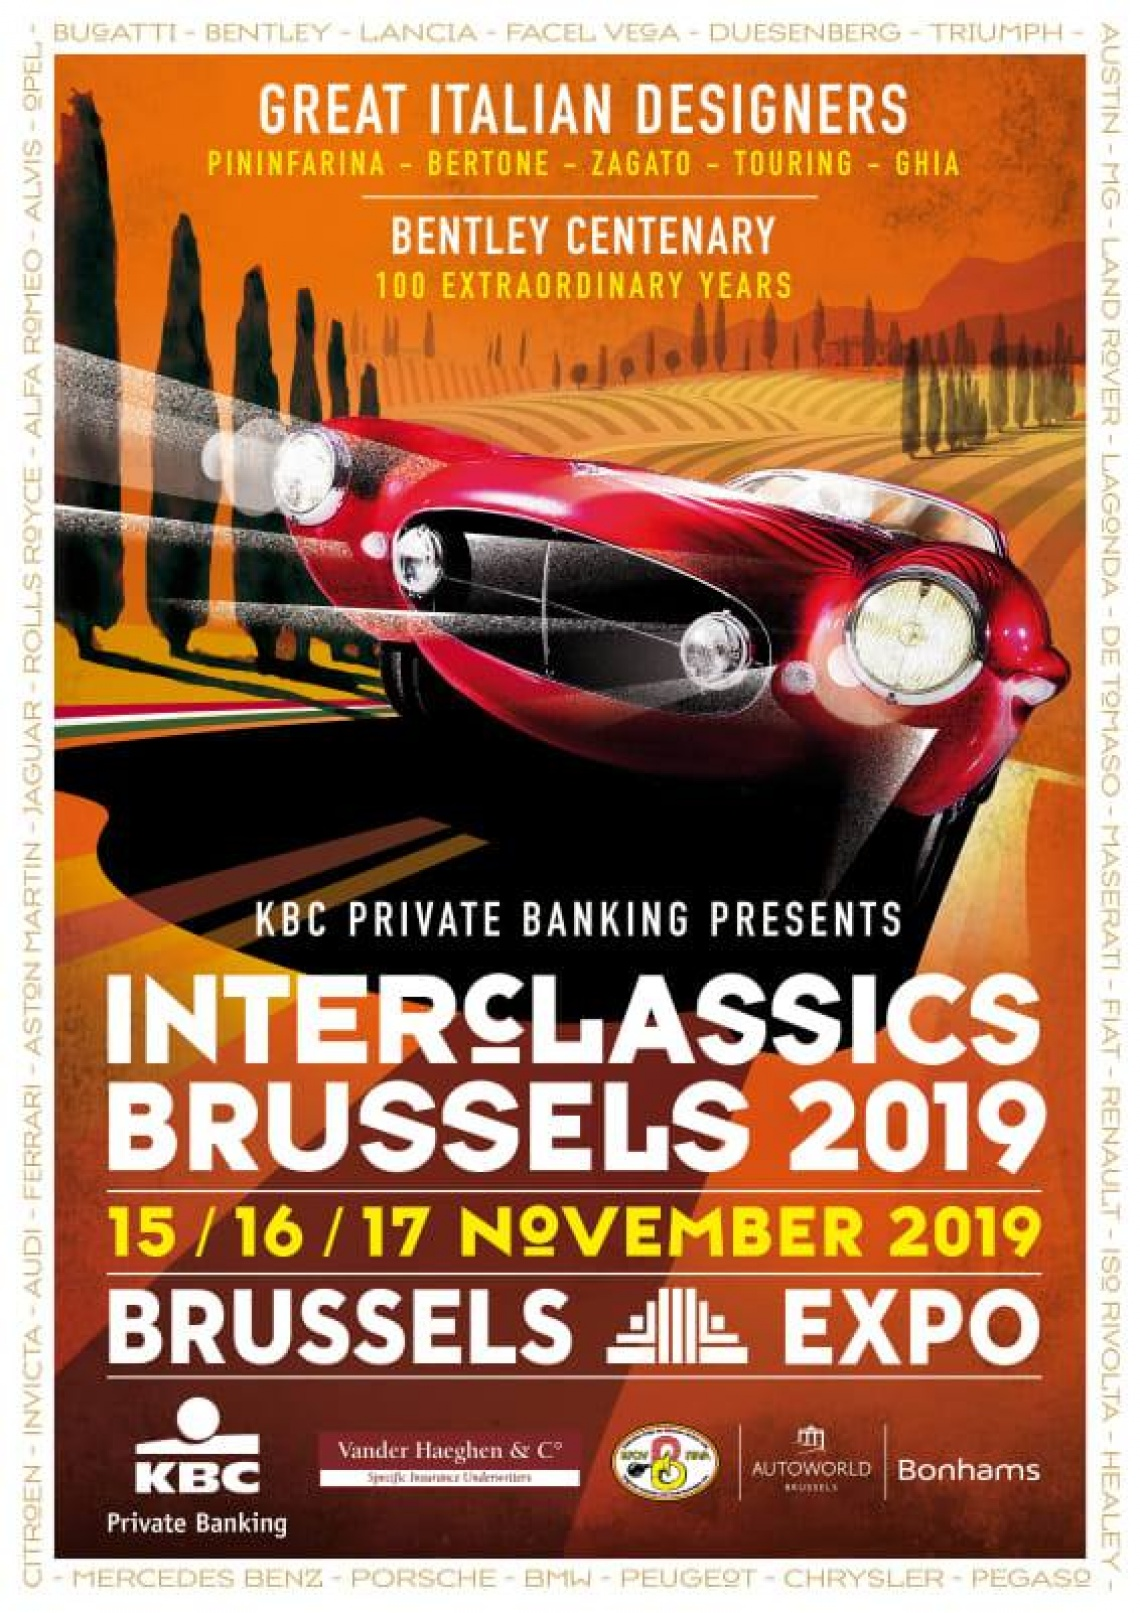 Interclassics 2019 @ Brussels Expo